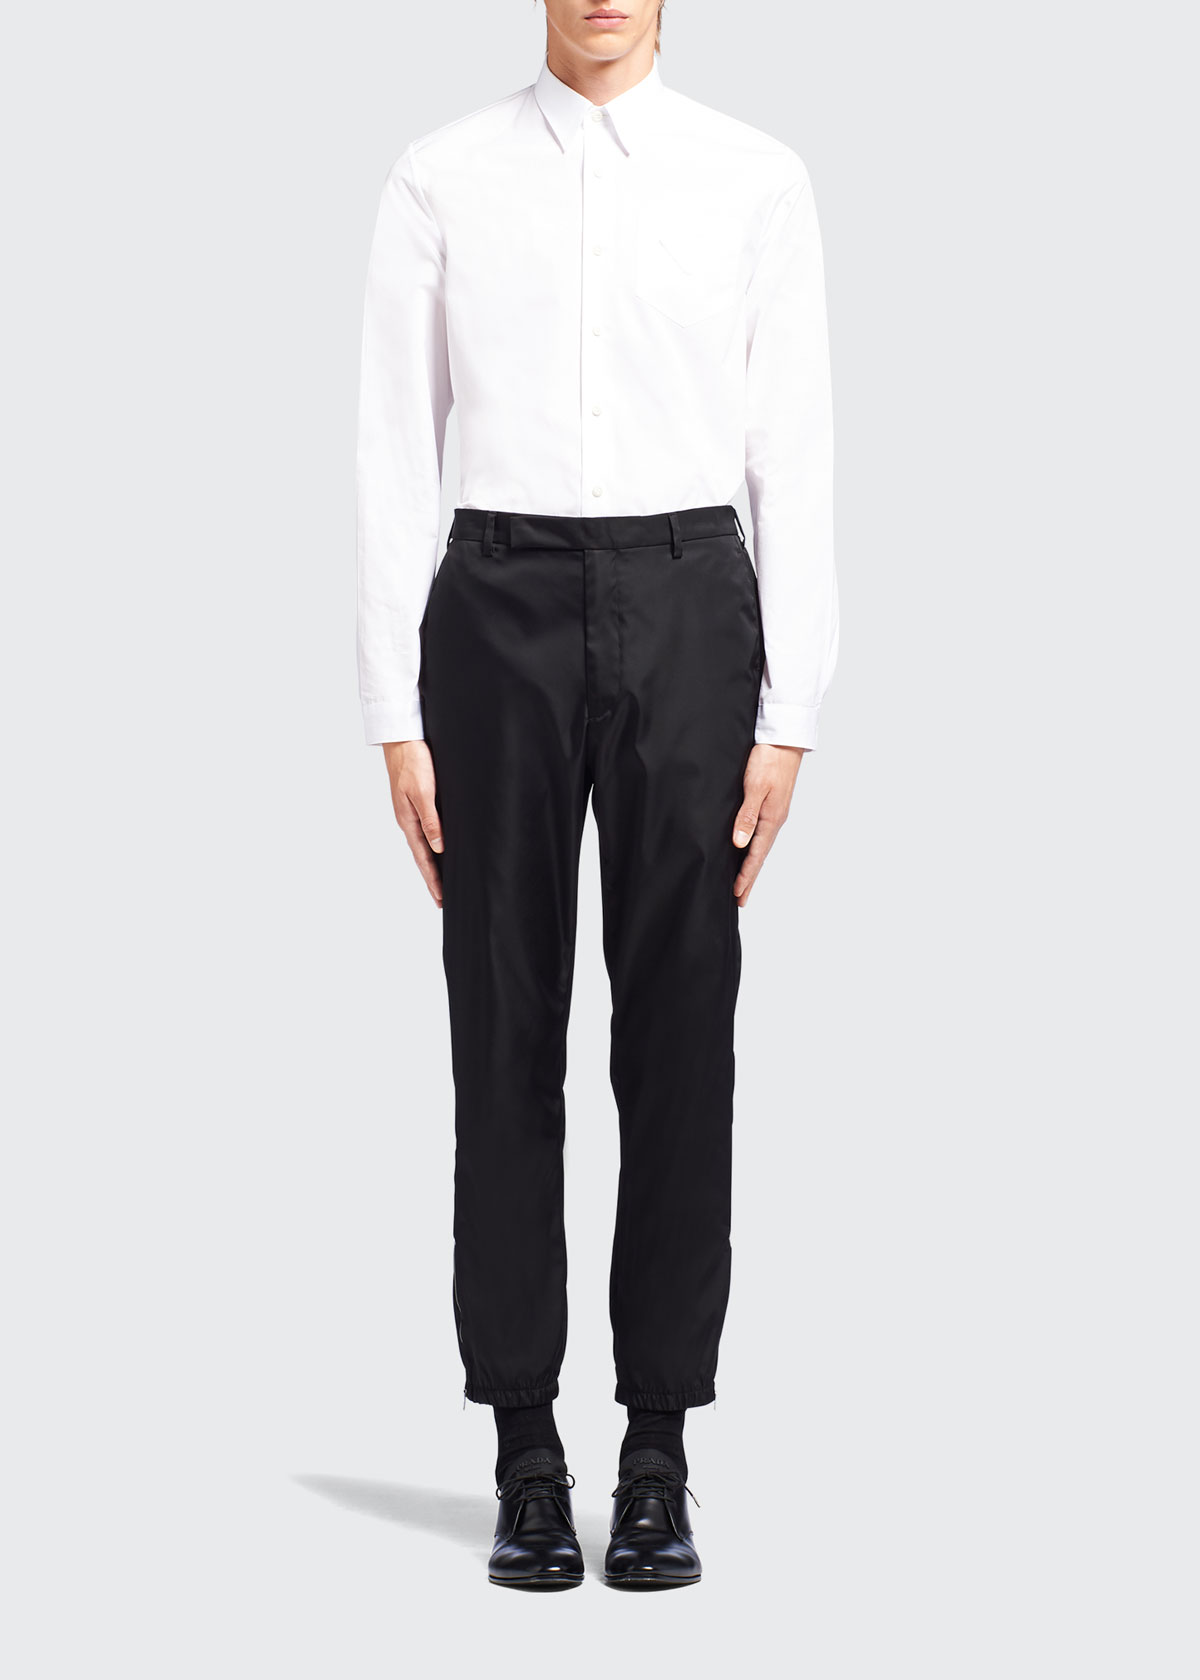 Prada MEN'S RE-NYLON JOGGER PANTS